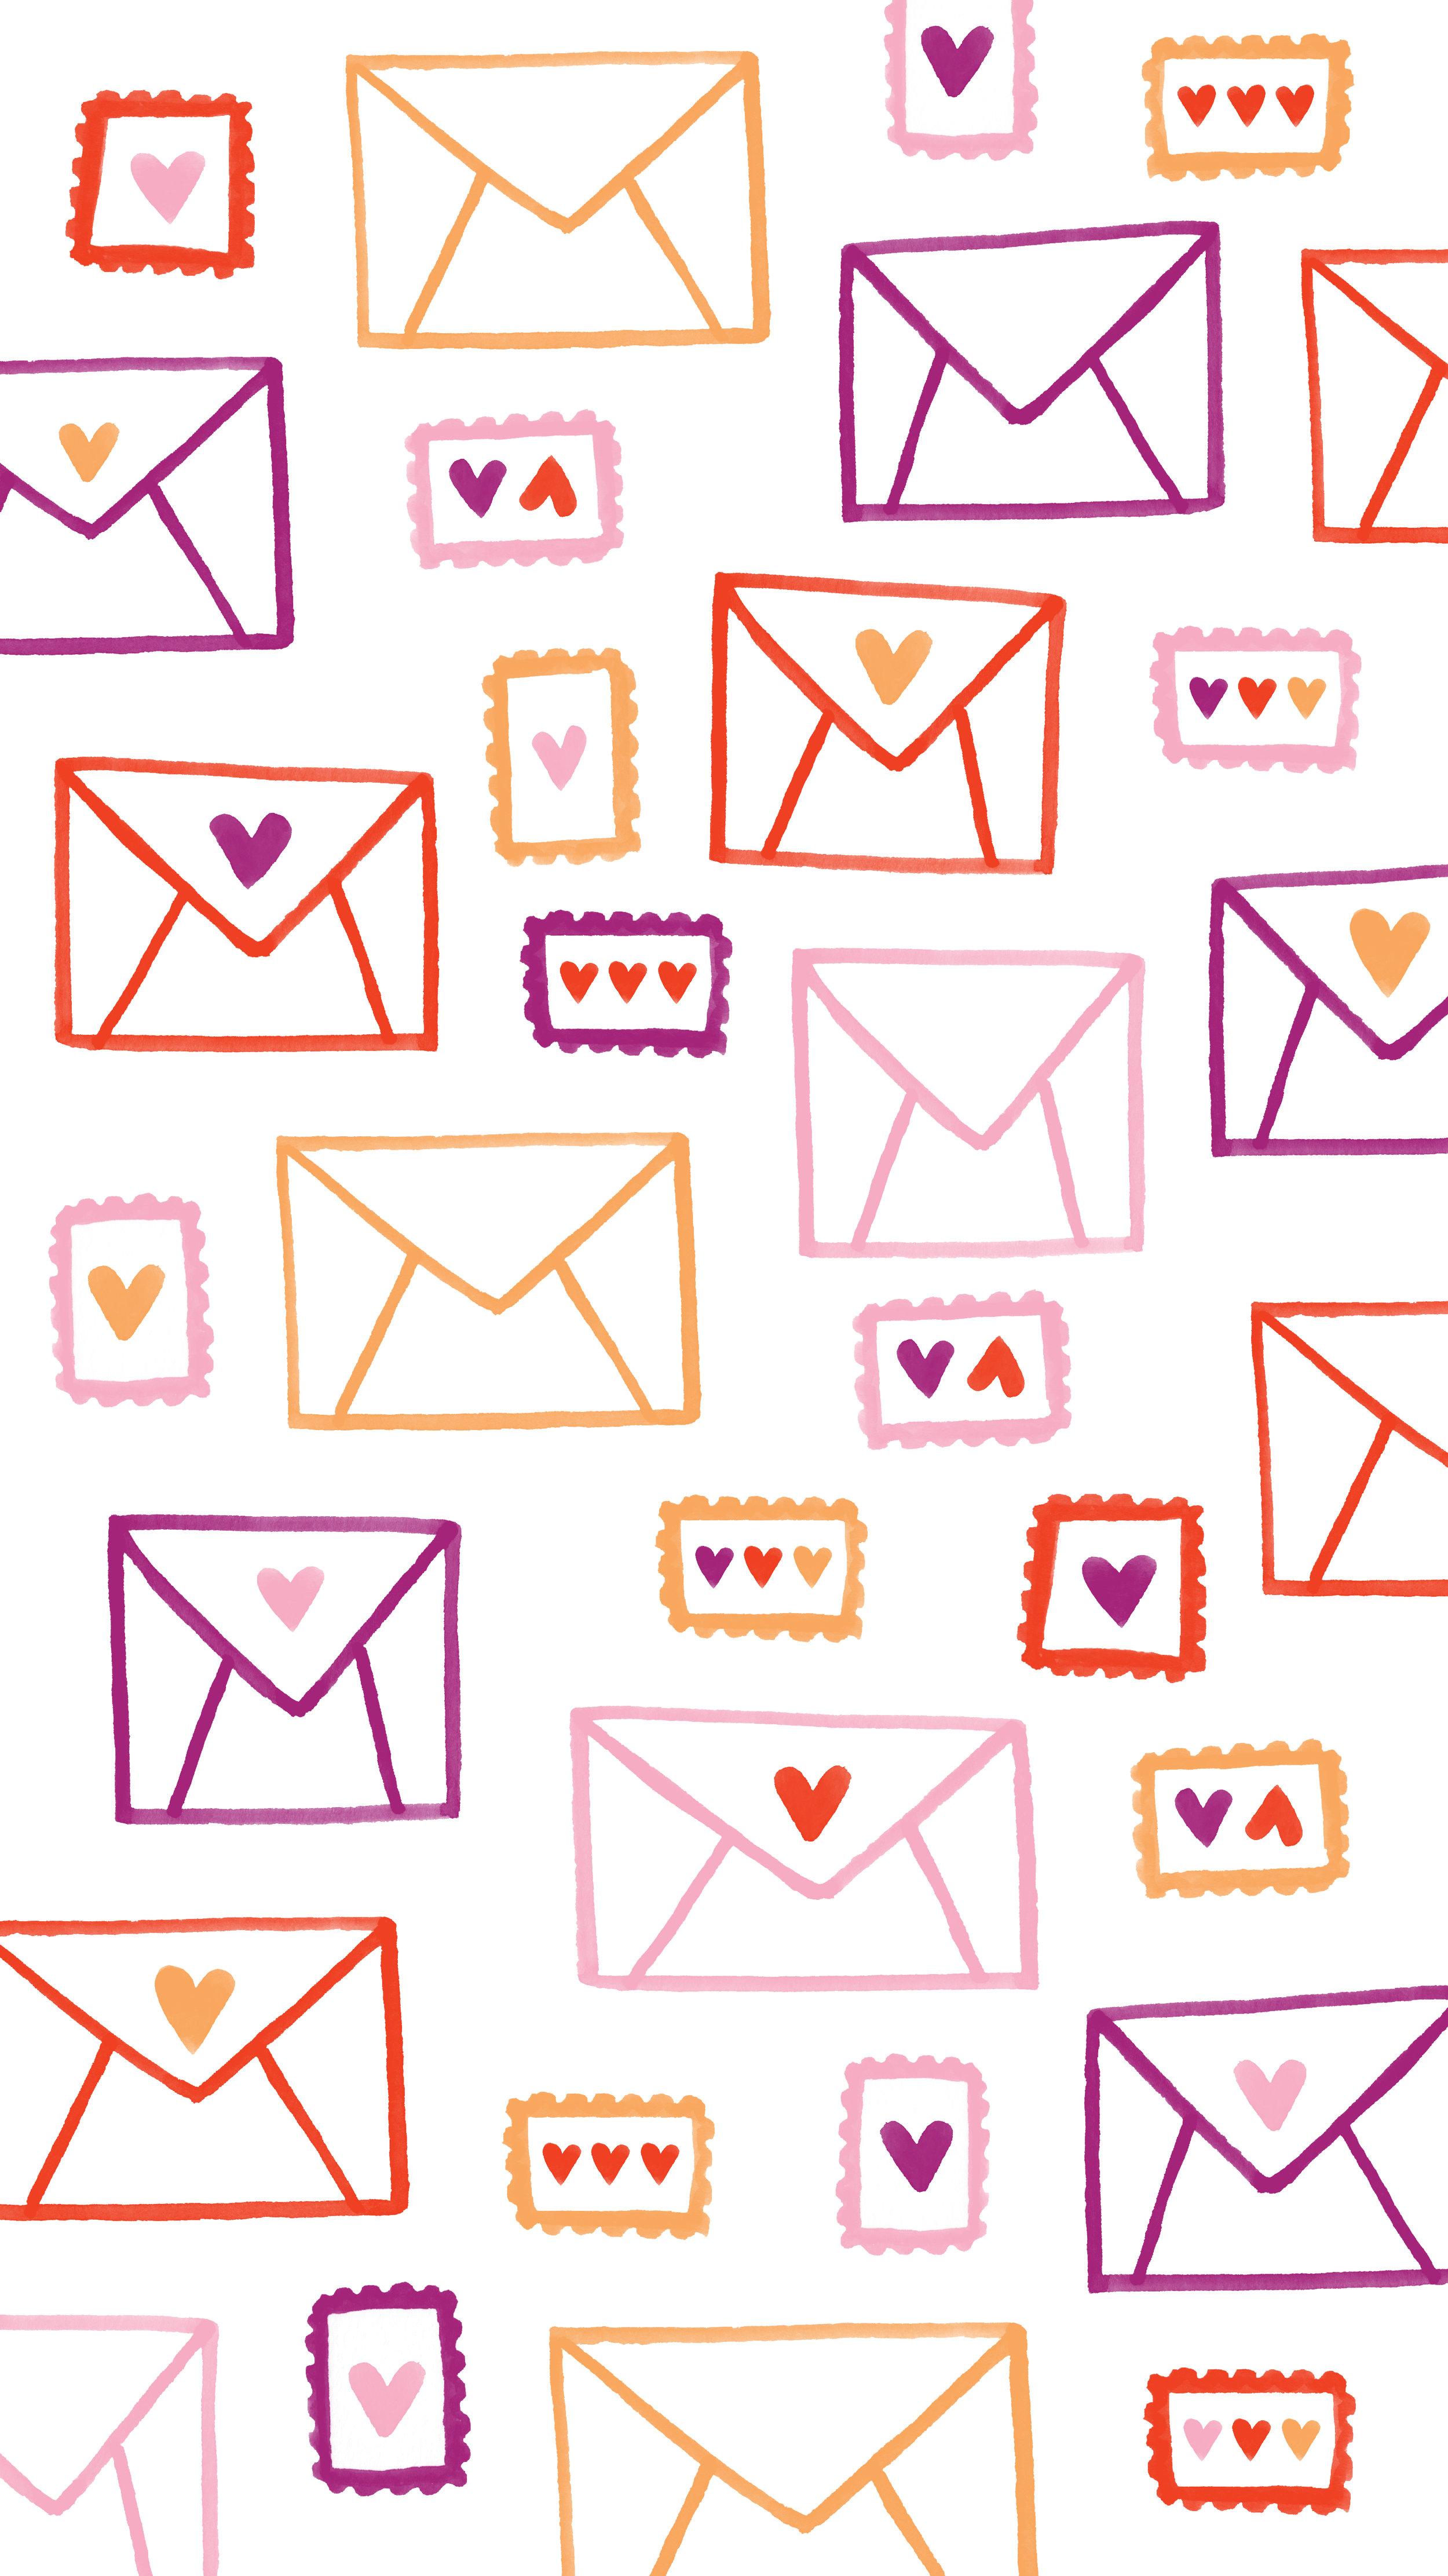 love_letters-01.jpg